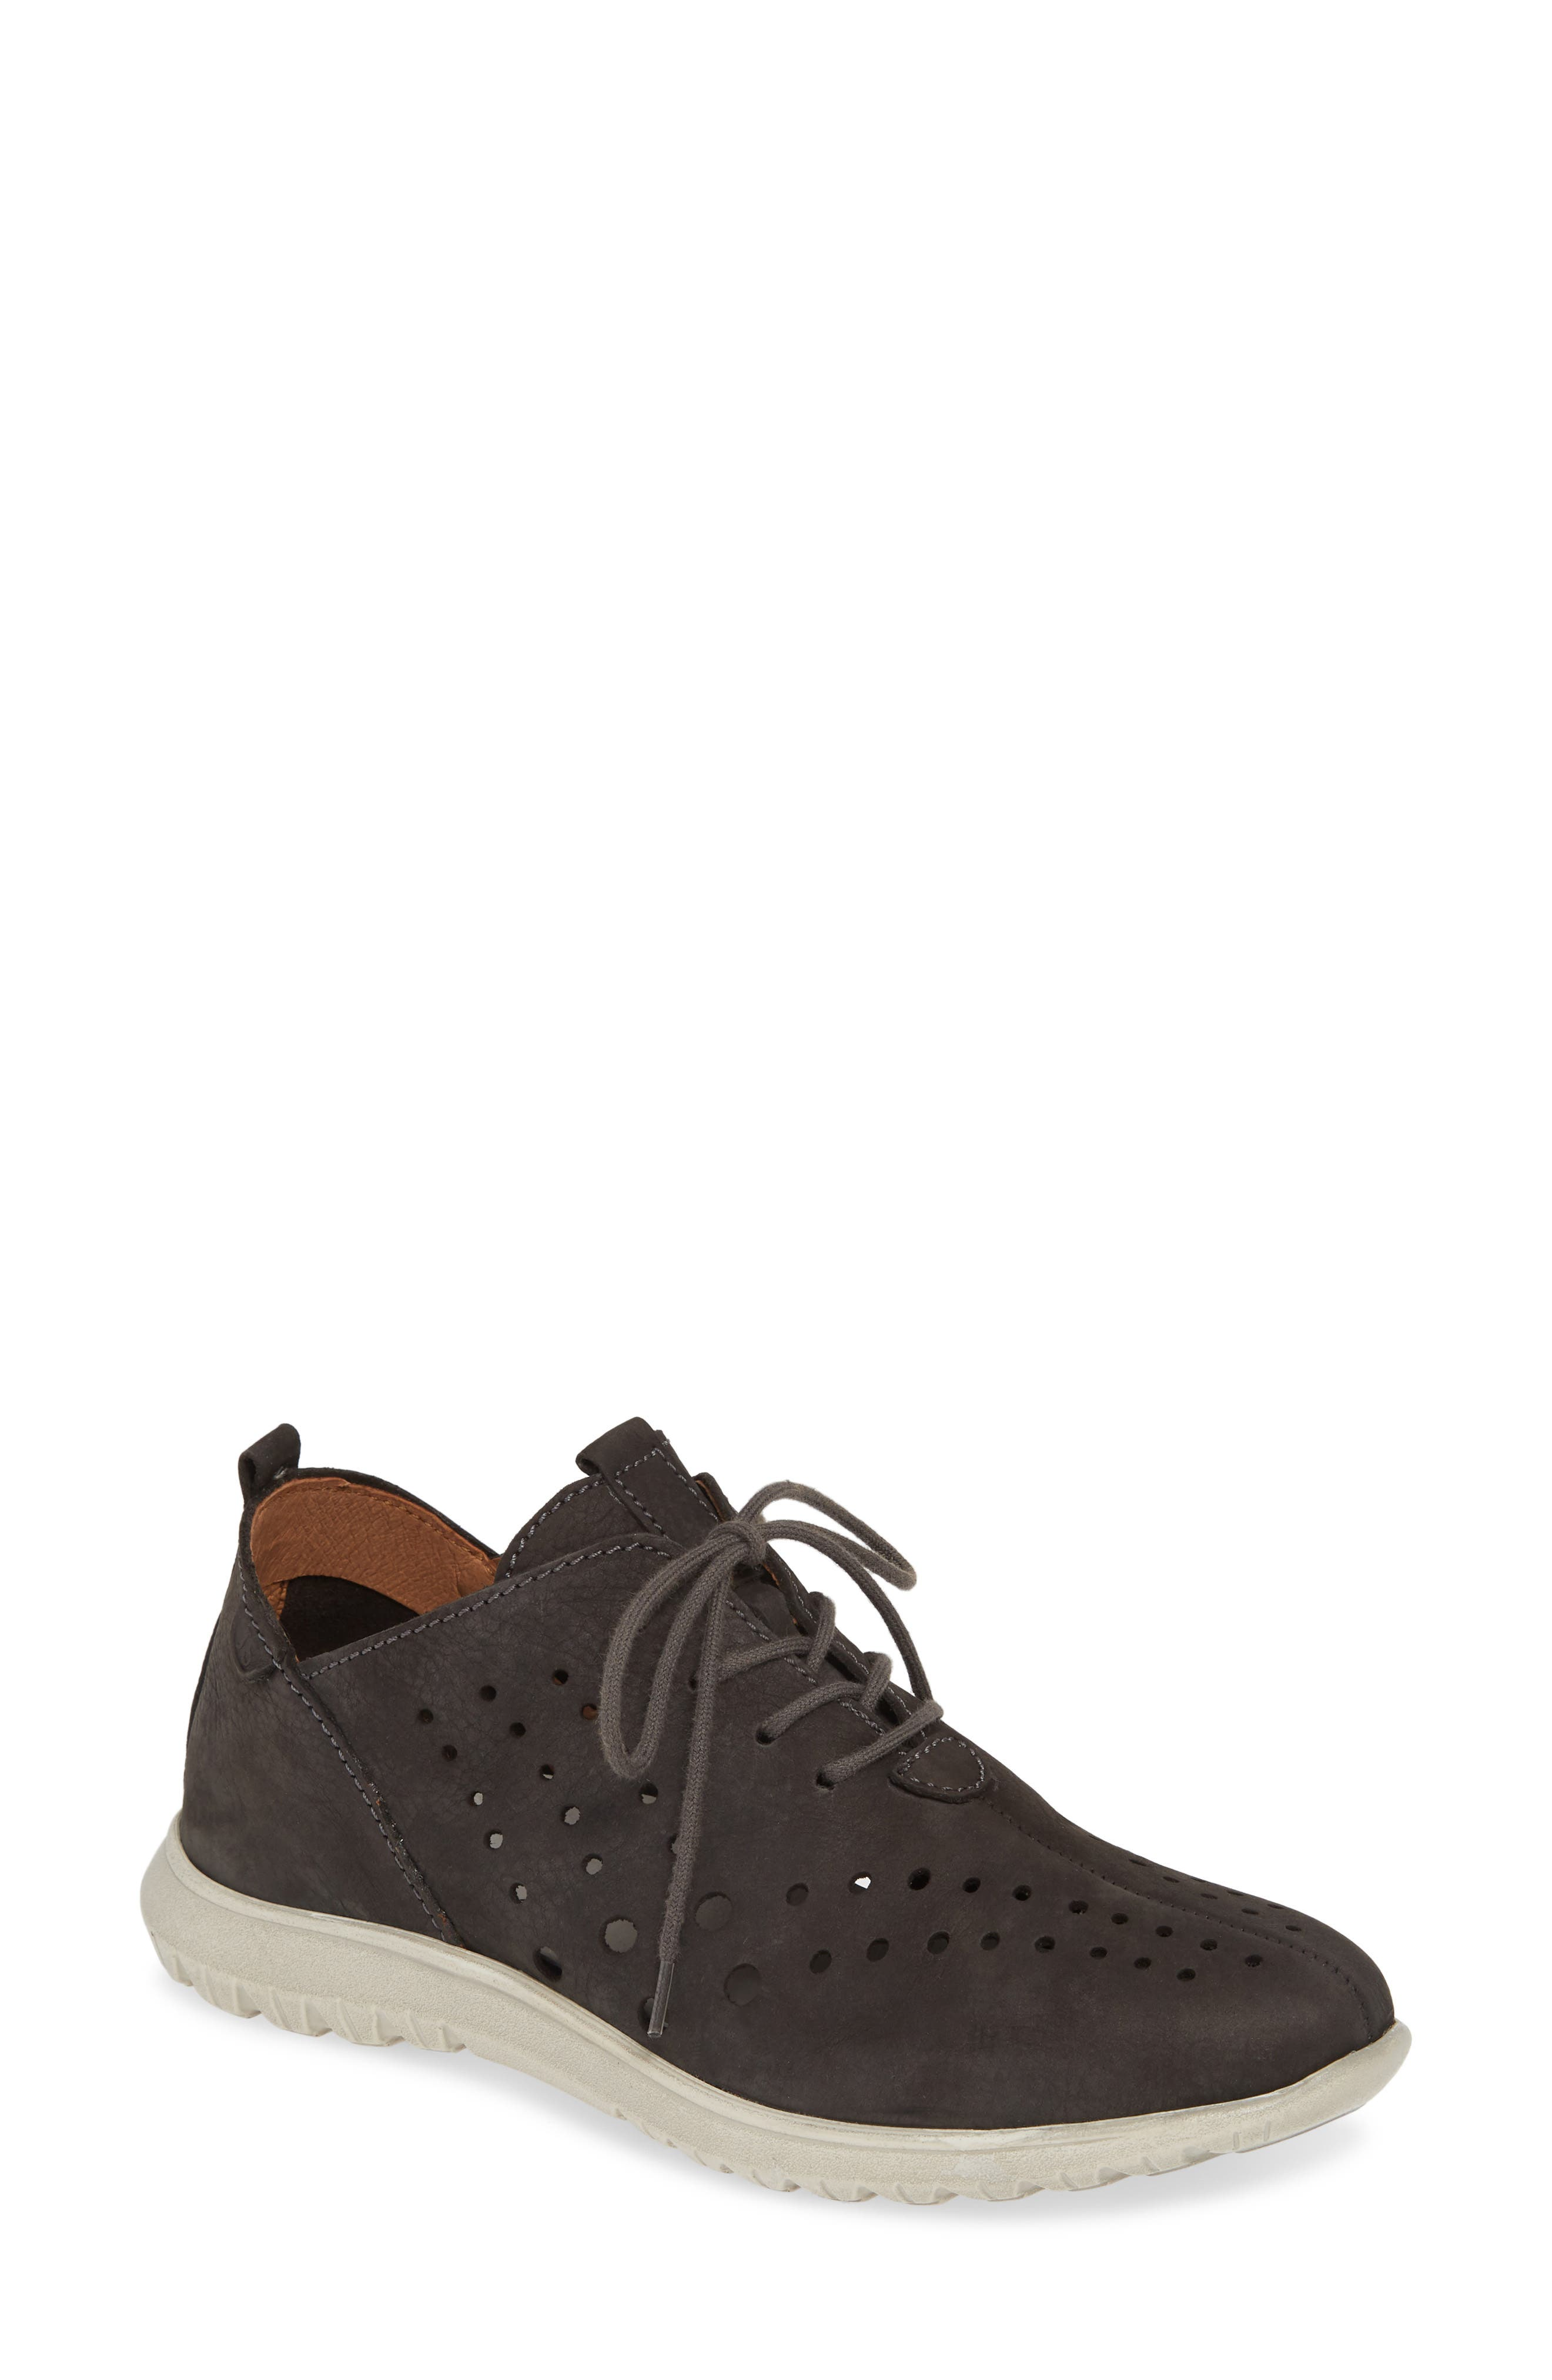 Josef Seibel Malena 09 Sneaker, Grey